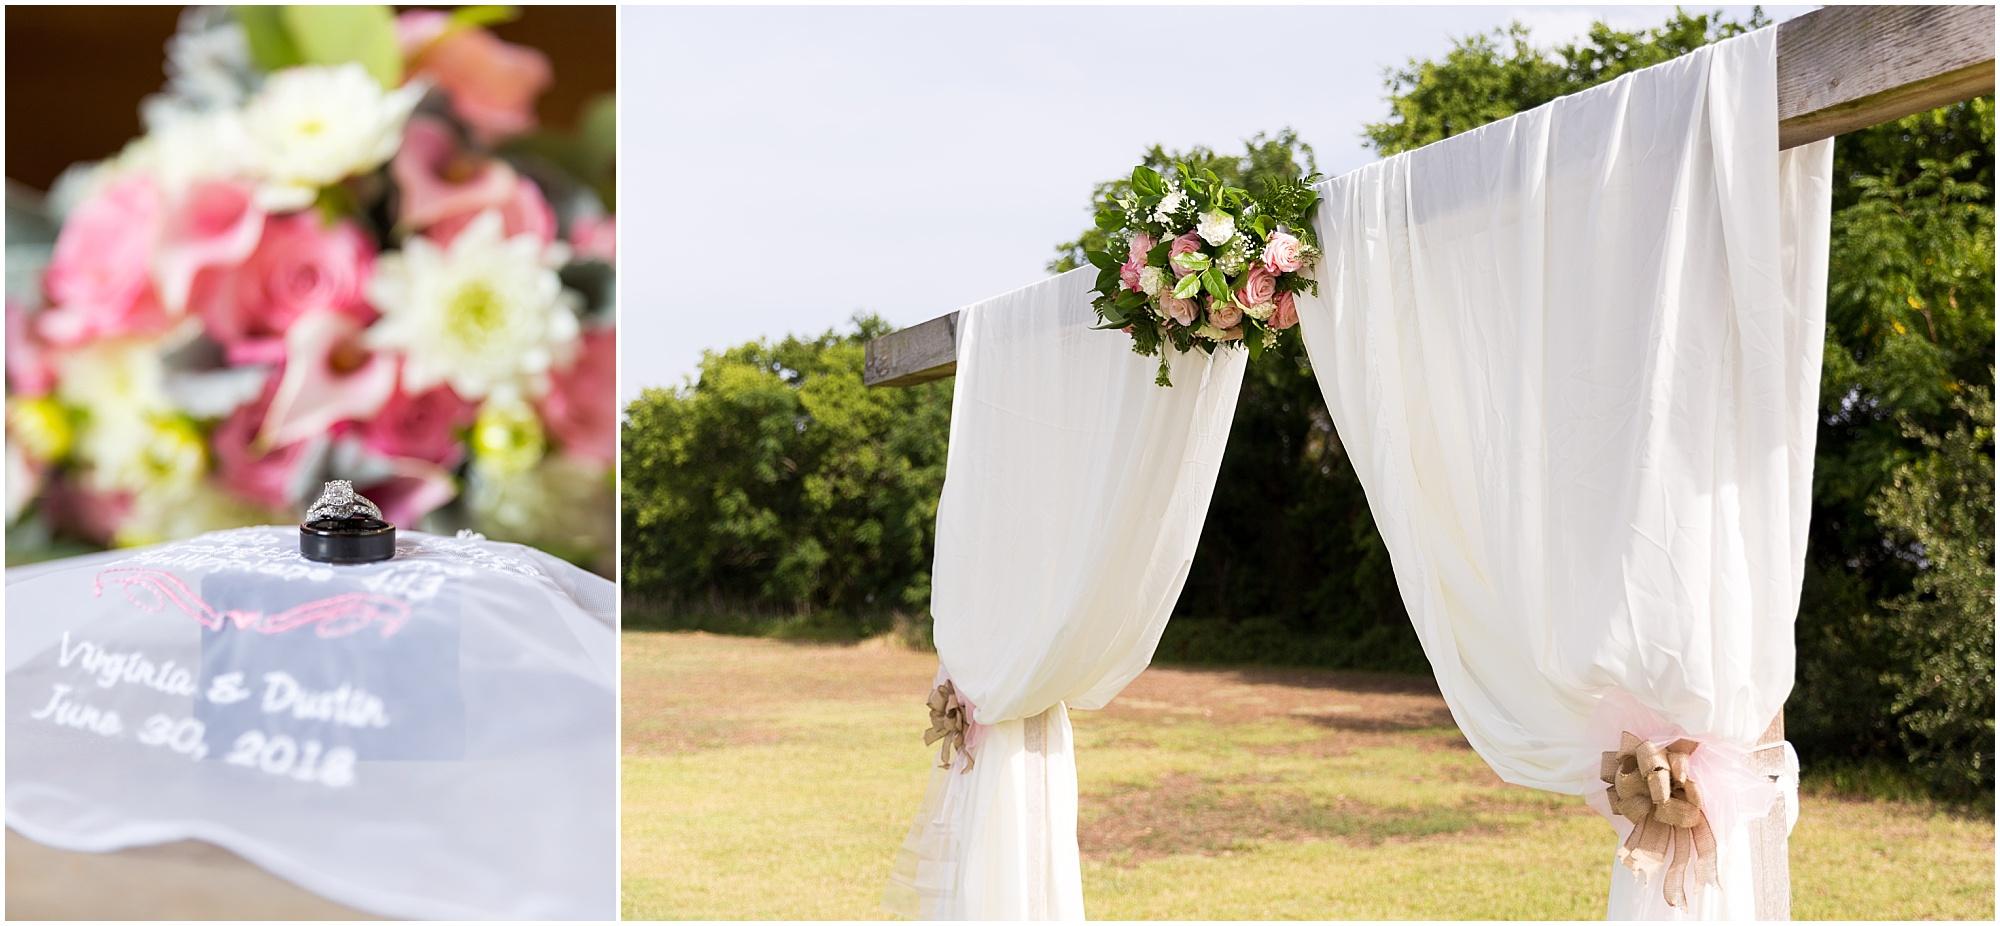 Rustic wedding details, ring shot and flowers - Jason & Melaina Photography